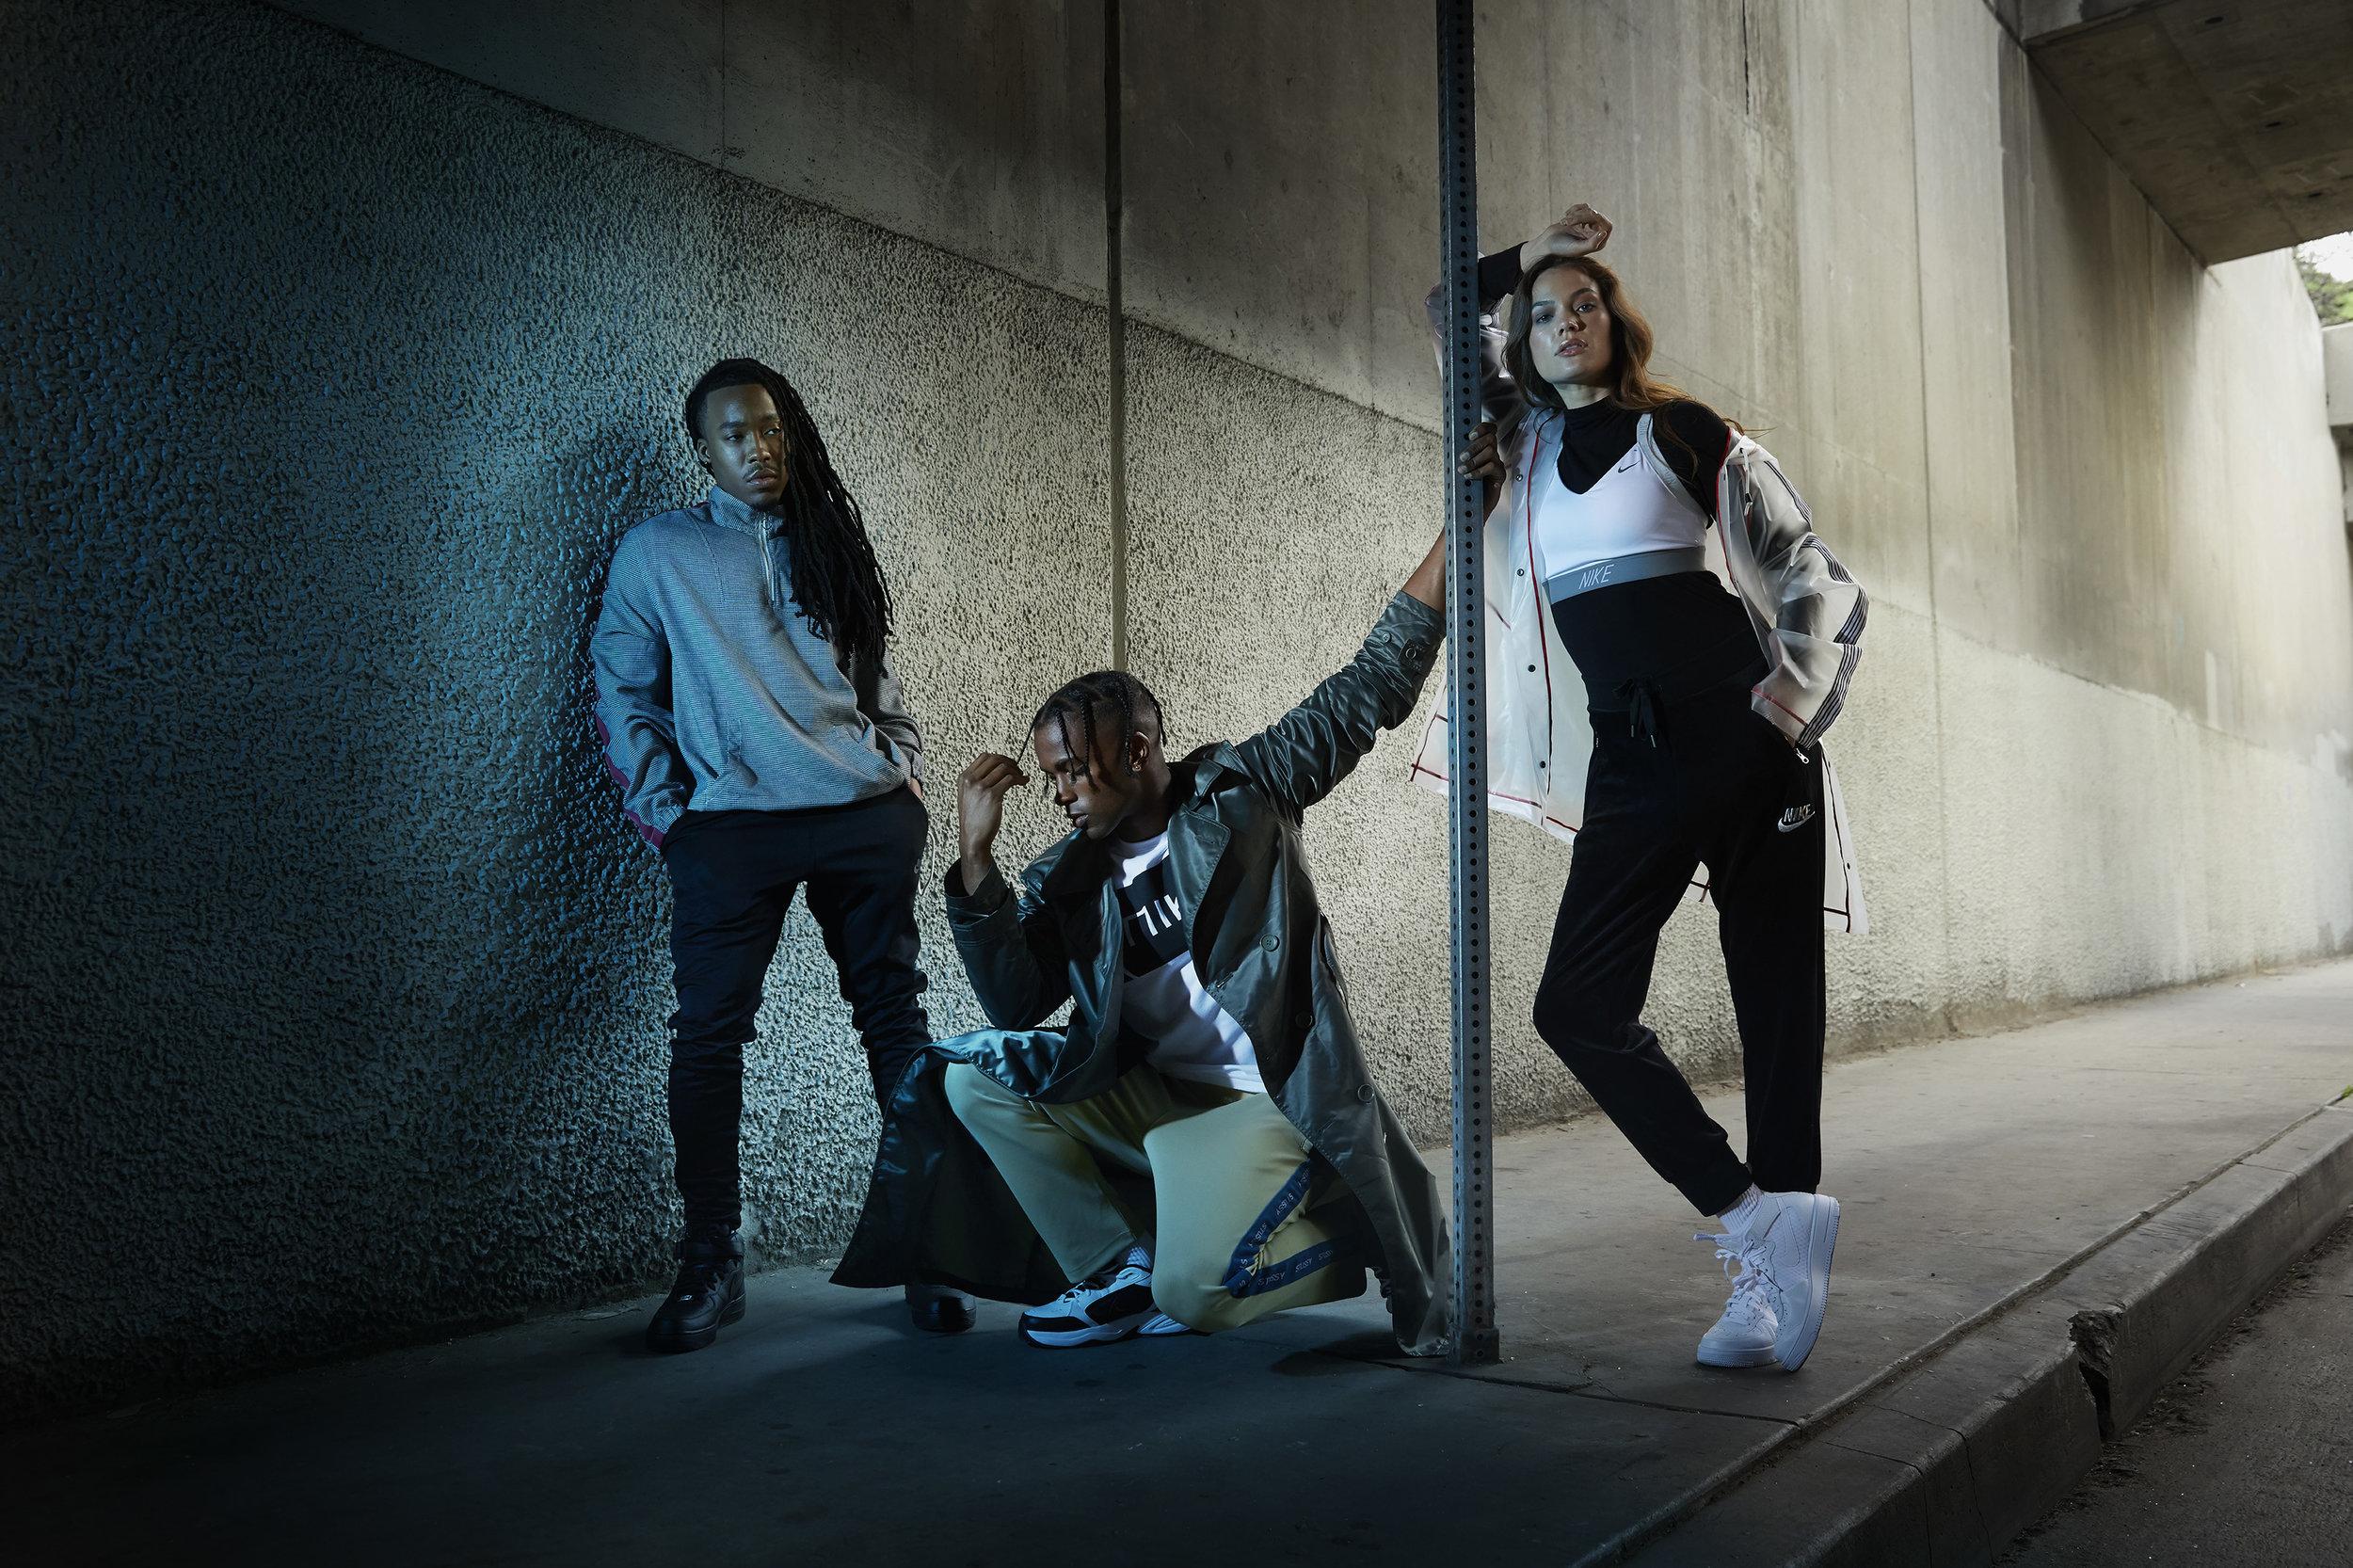 Nike-Location_0395.jpg